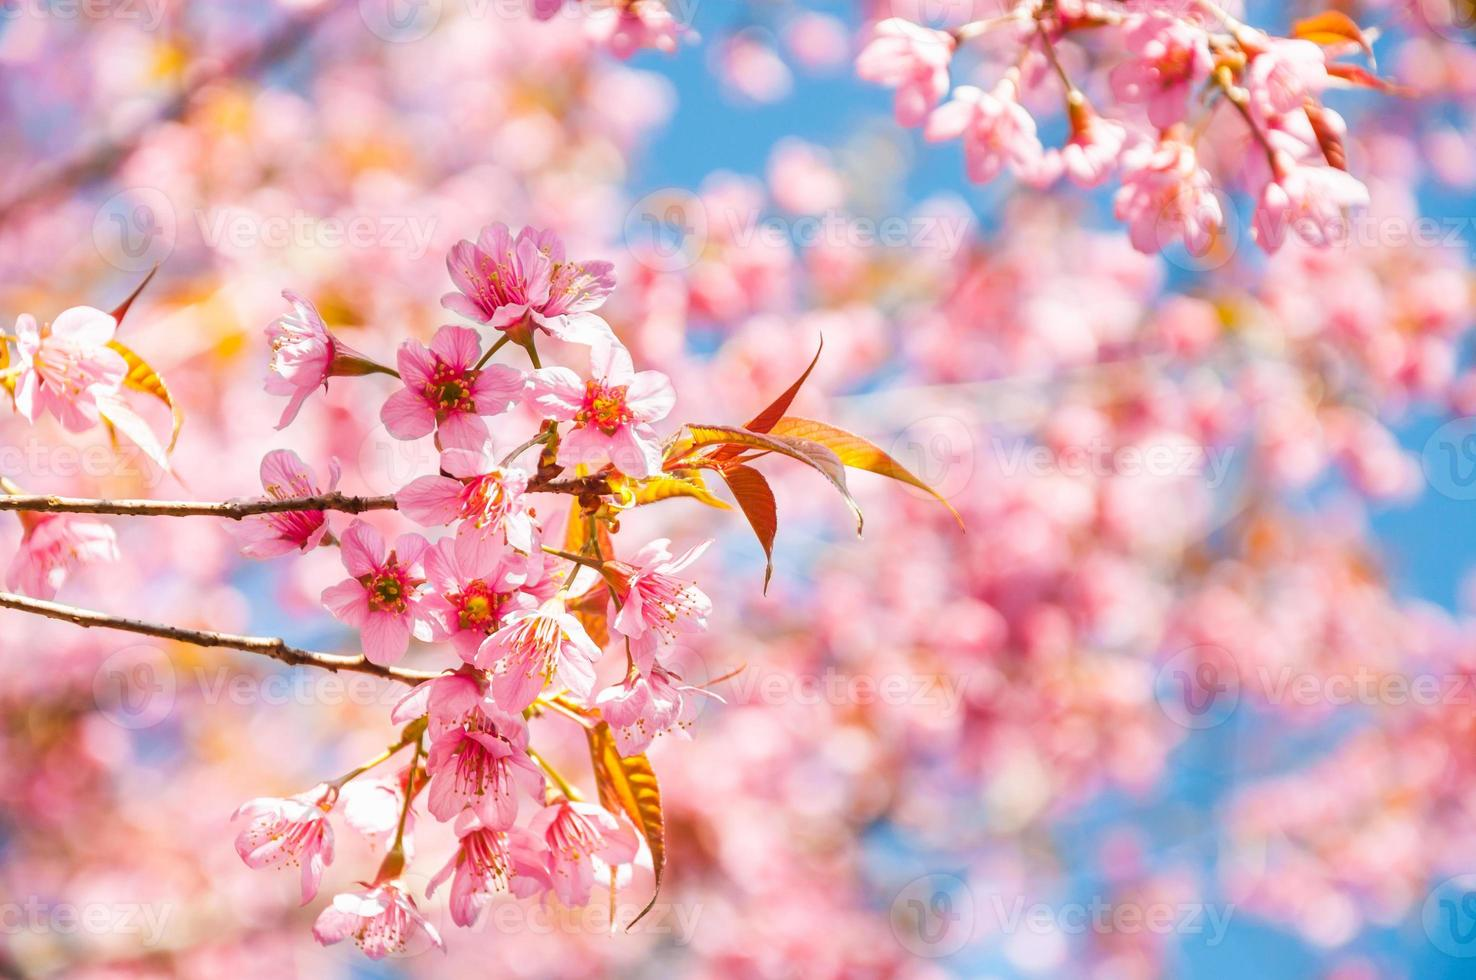 flor de sakura rosa floreciendo foto